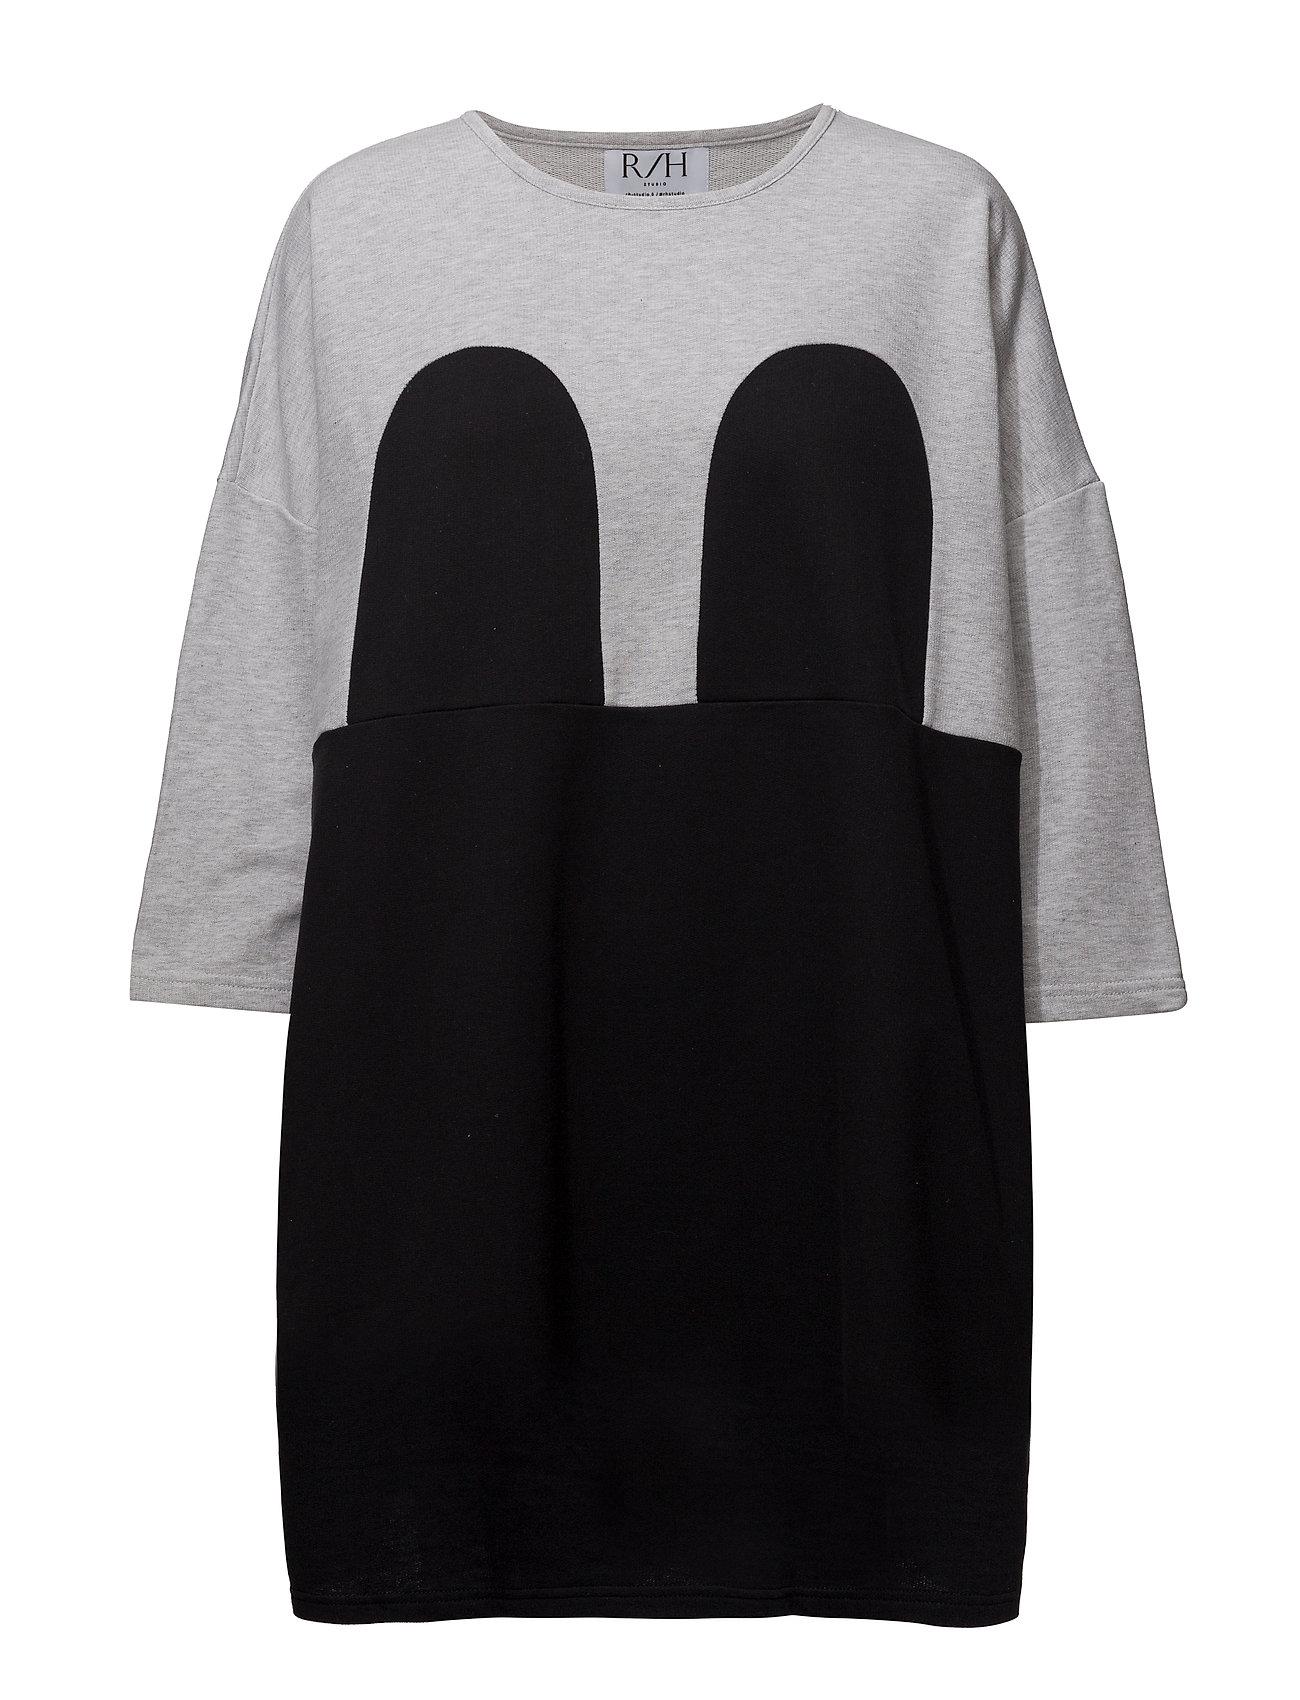 R/H Studio Mickey Square Dress - LIGHT GREY / BLACK